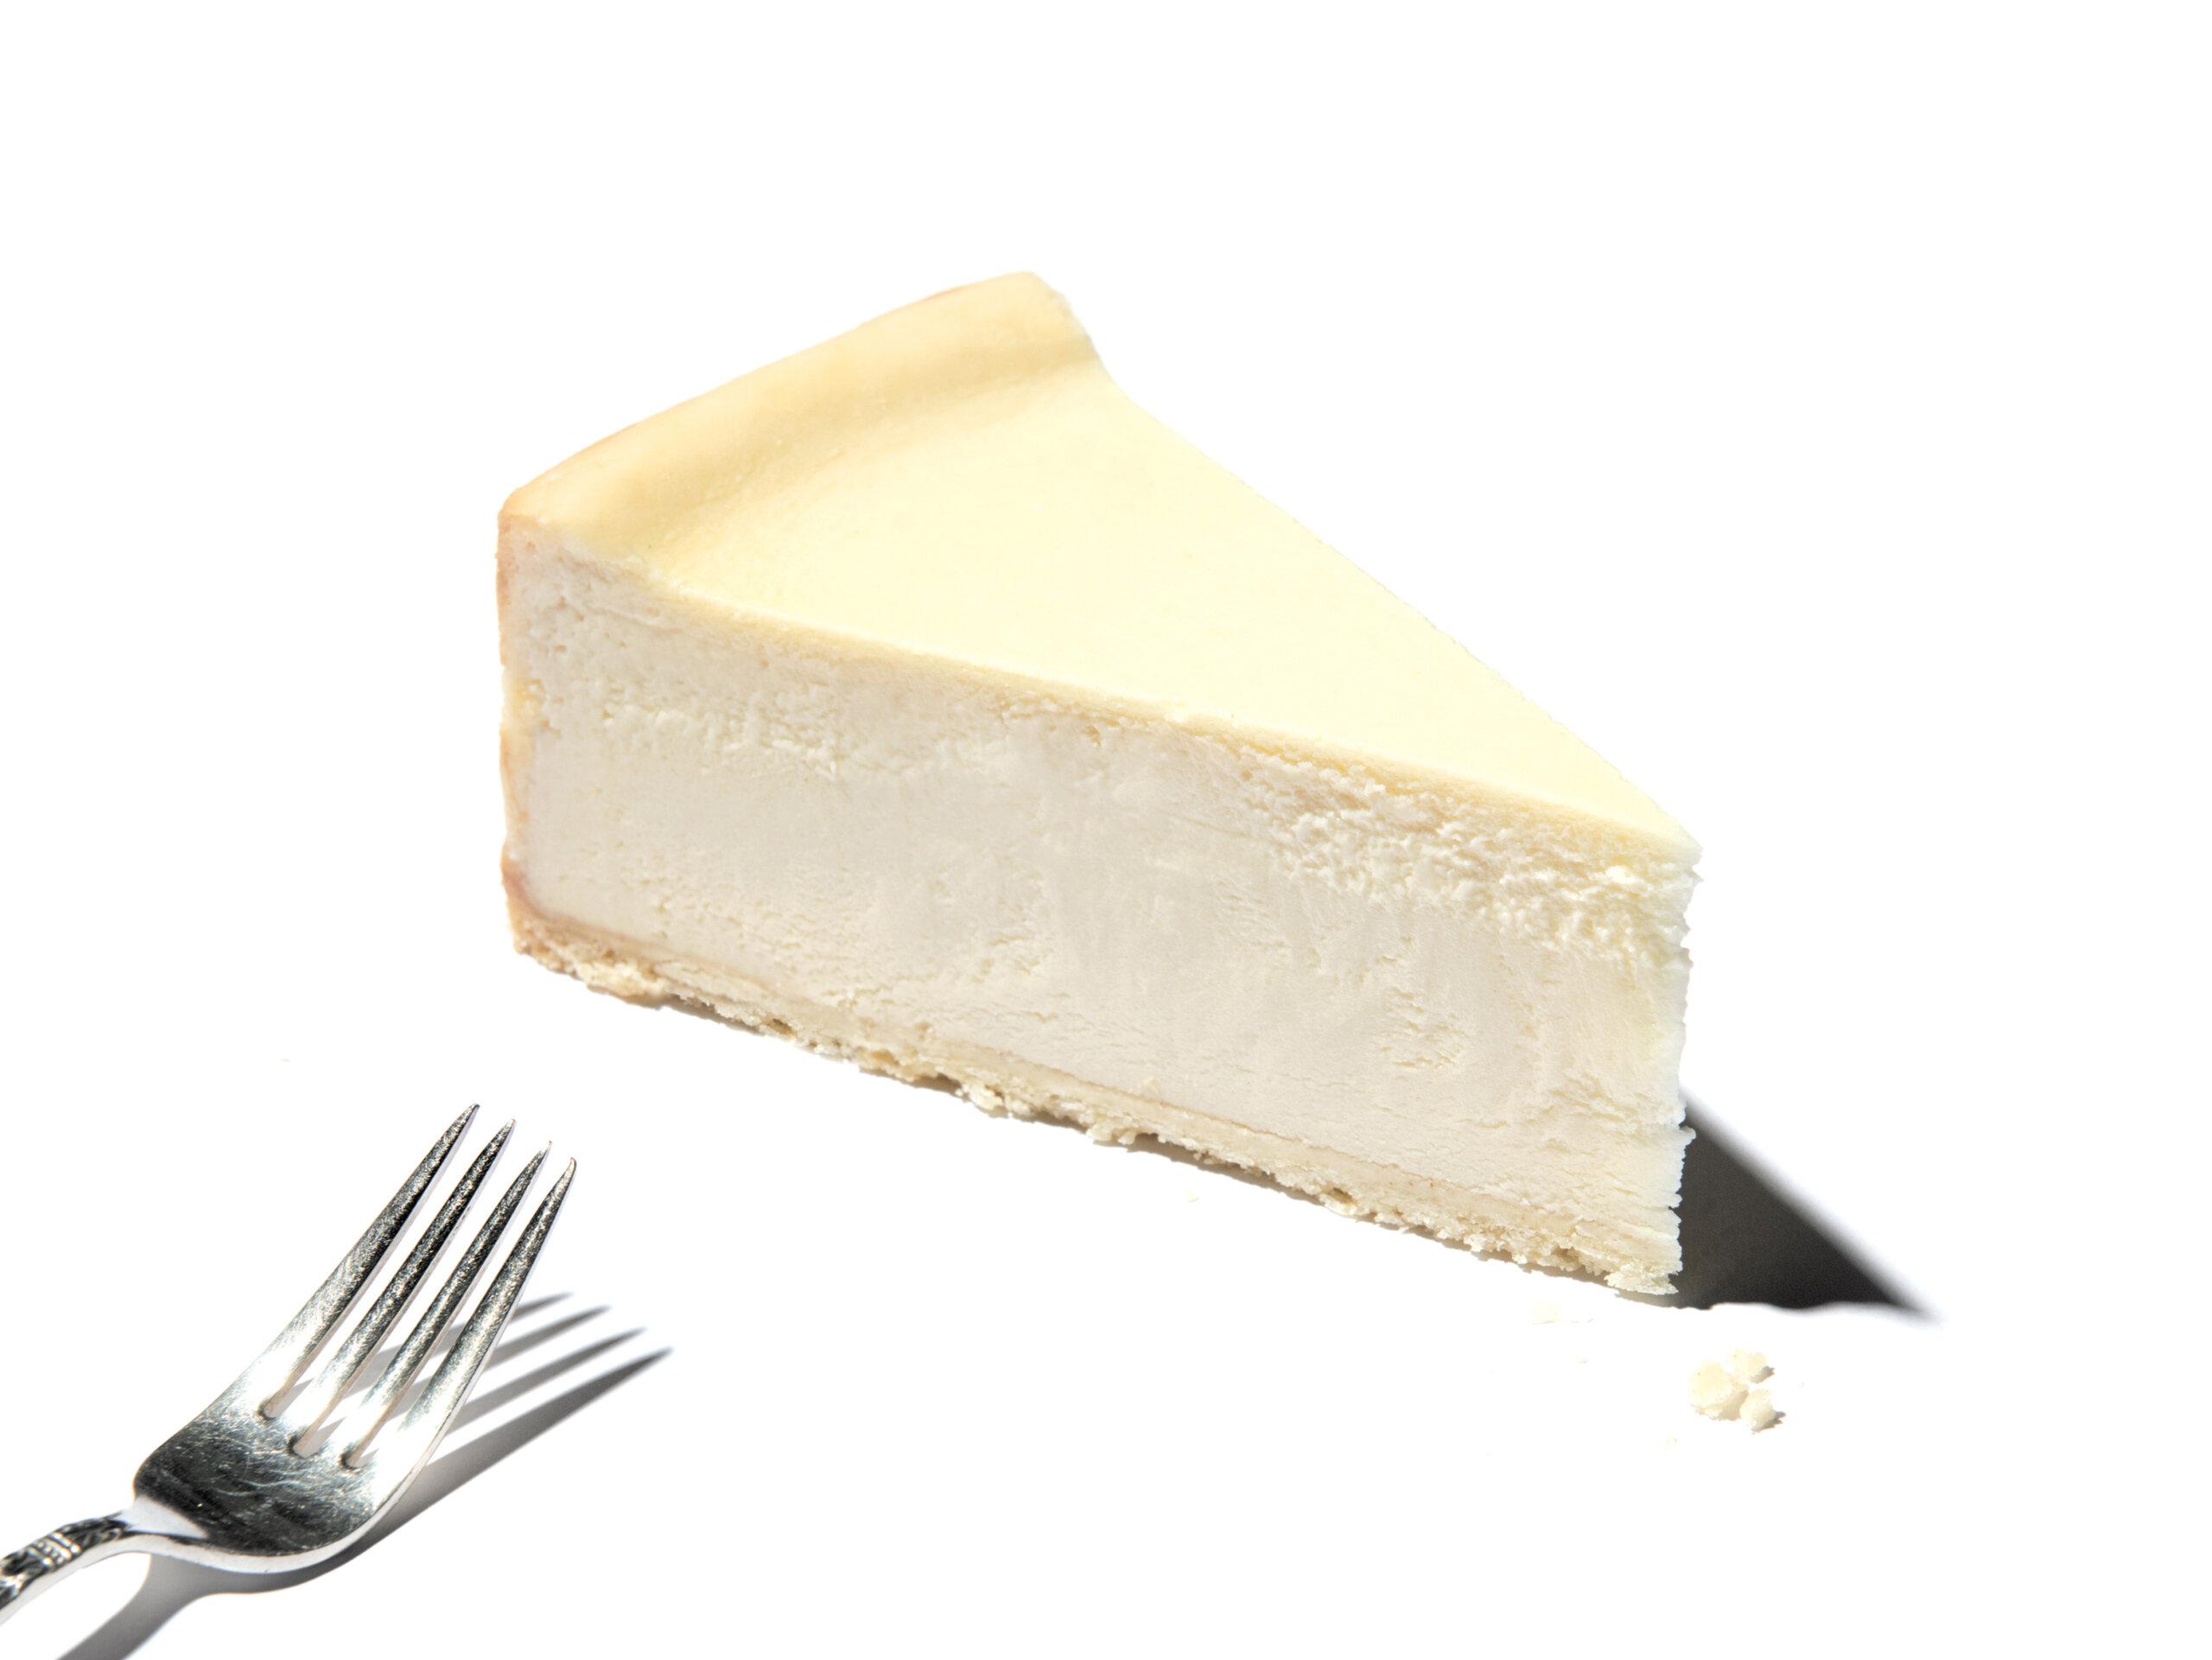 A slice of Eli's OriginalPlain Cheesecake